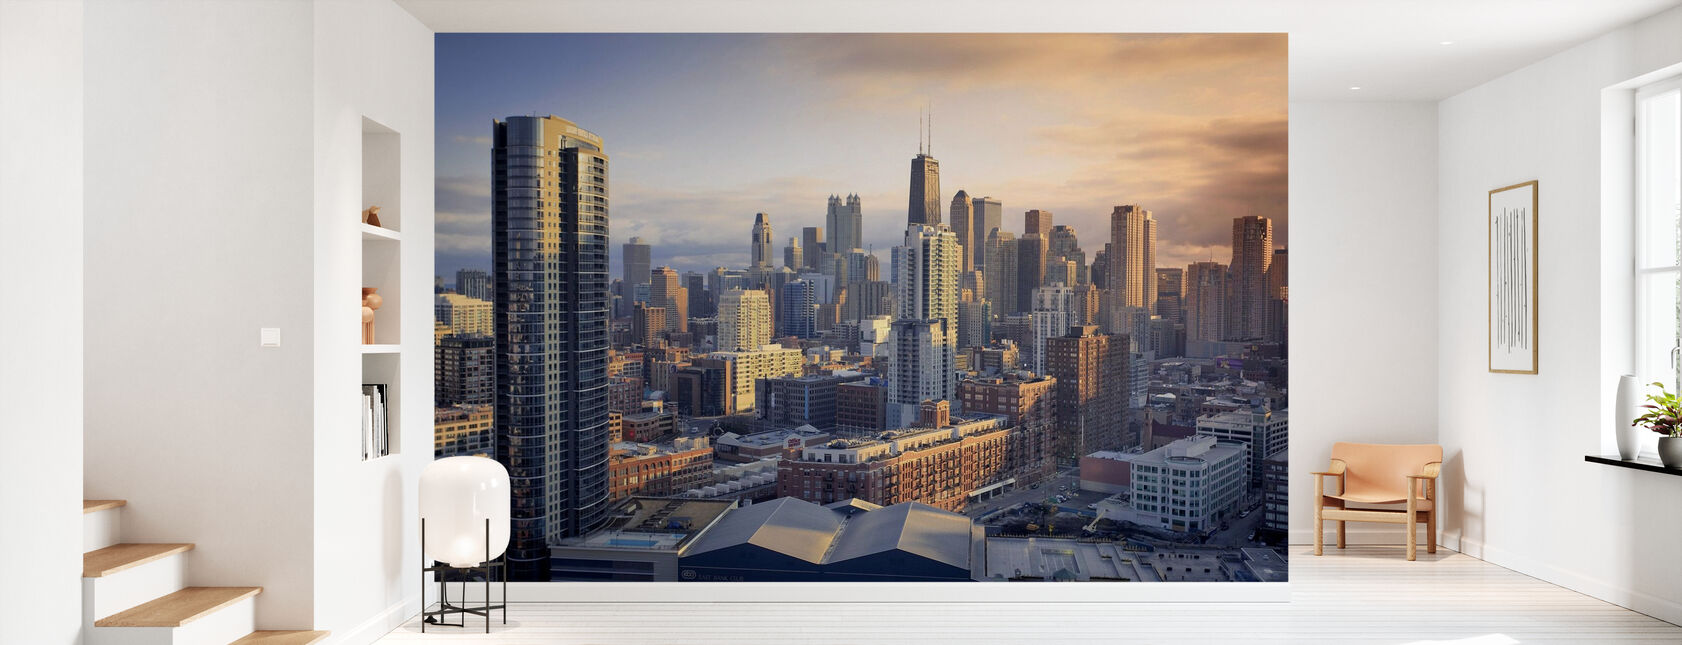 Chicago symfoni - Tapet - Entré